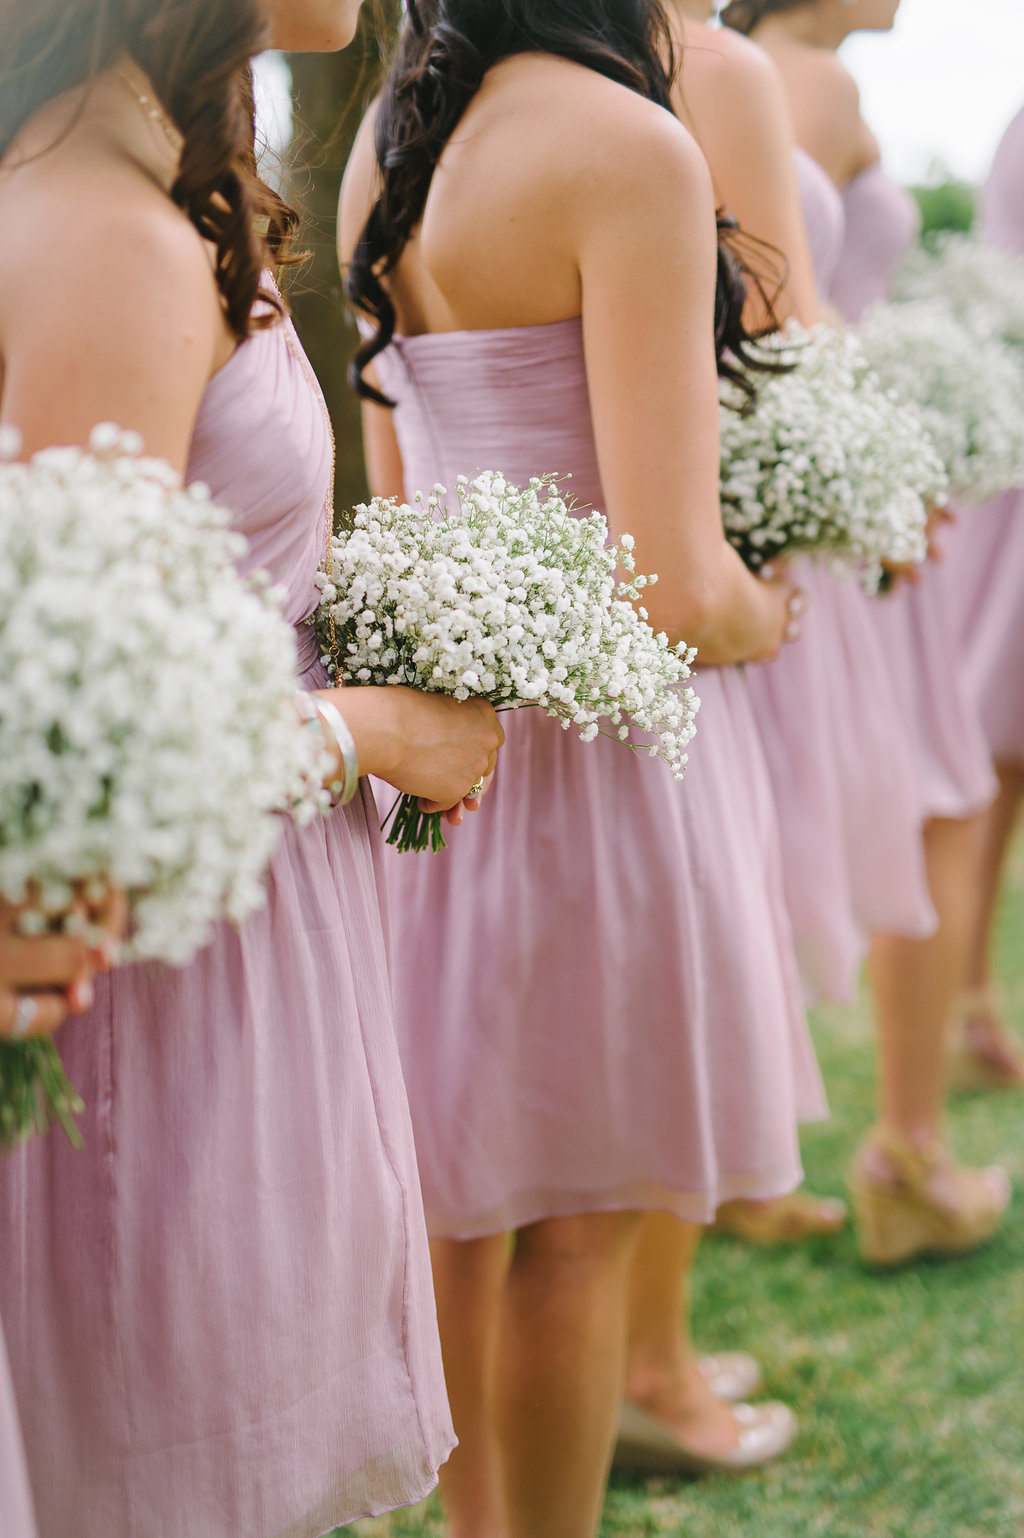 meagan-and-brenden-rach-loves-troy-photography-ivory-and-beau-bridal-boutqiue-ti-adora-wedding-dress-gold-lace-wedding-dress-savannah-wedding-planner-savannah-weddings-oldfield-plantation-wedding-savannah-florist-74.jpg